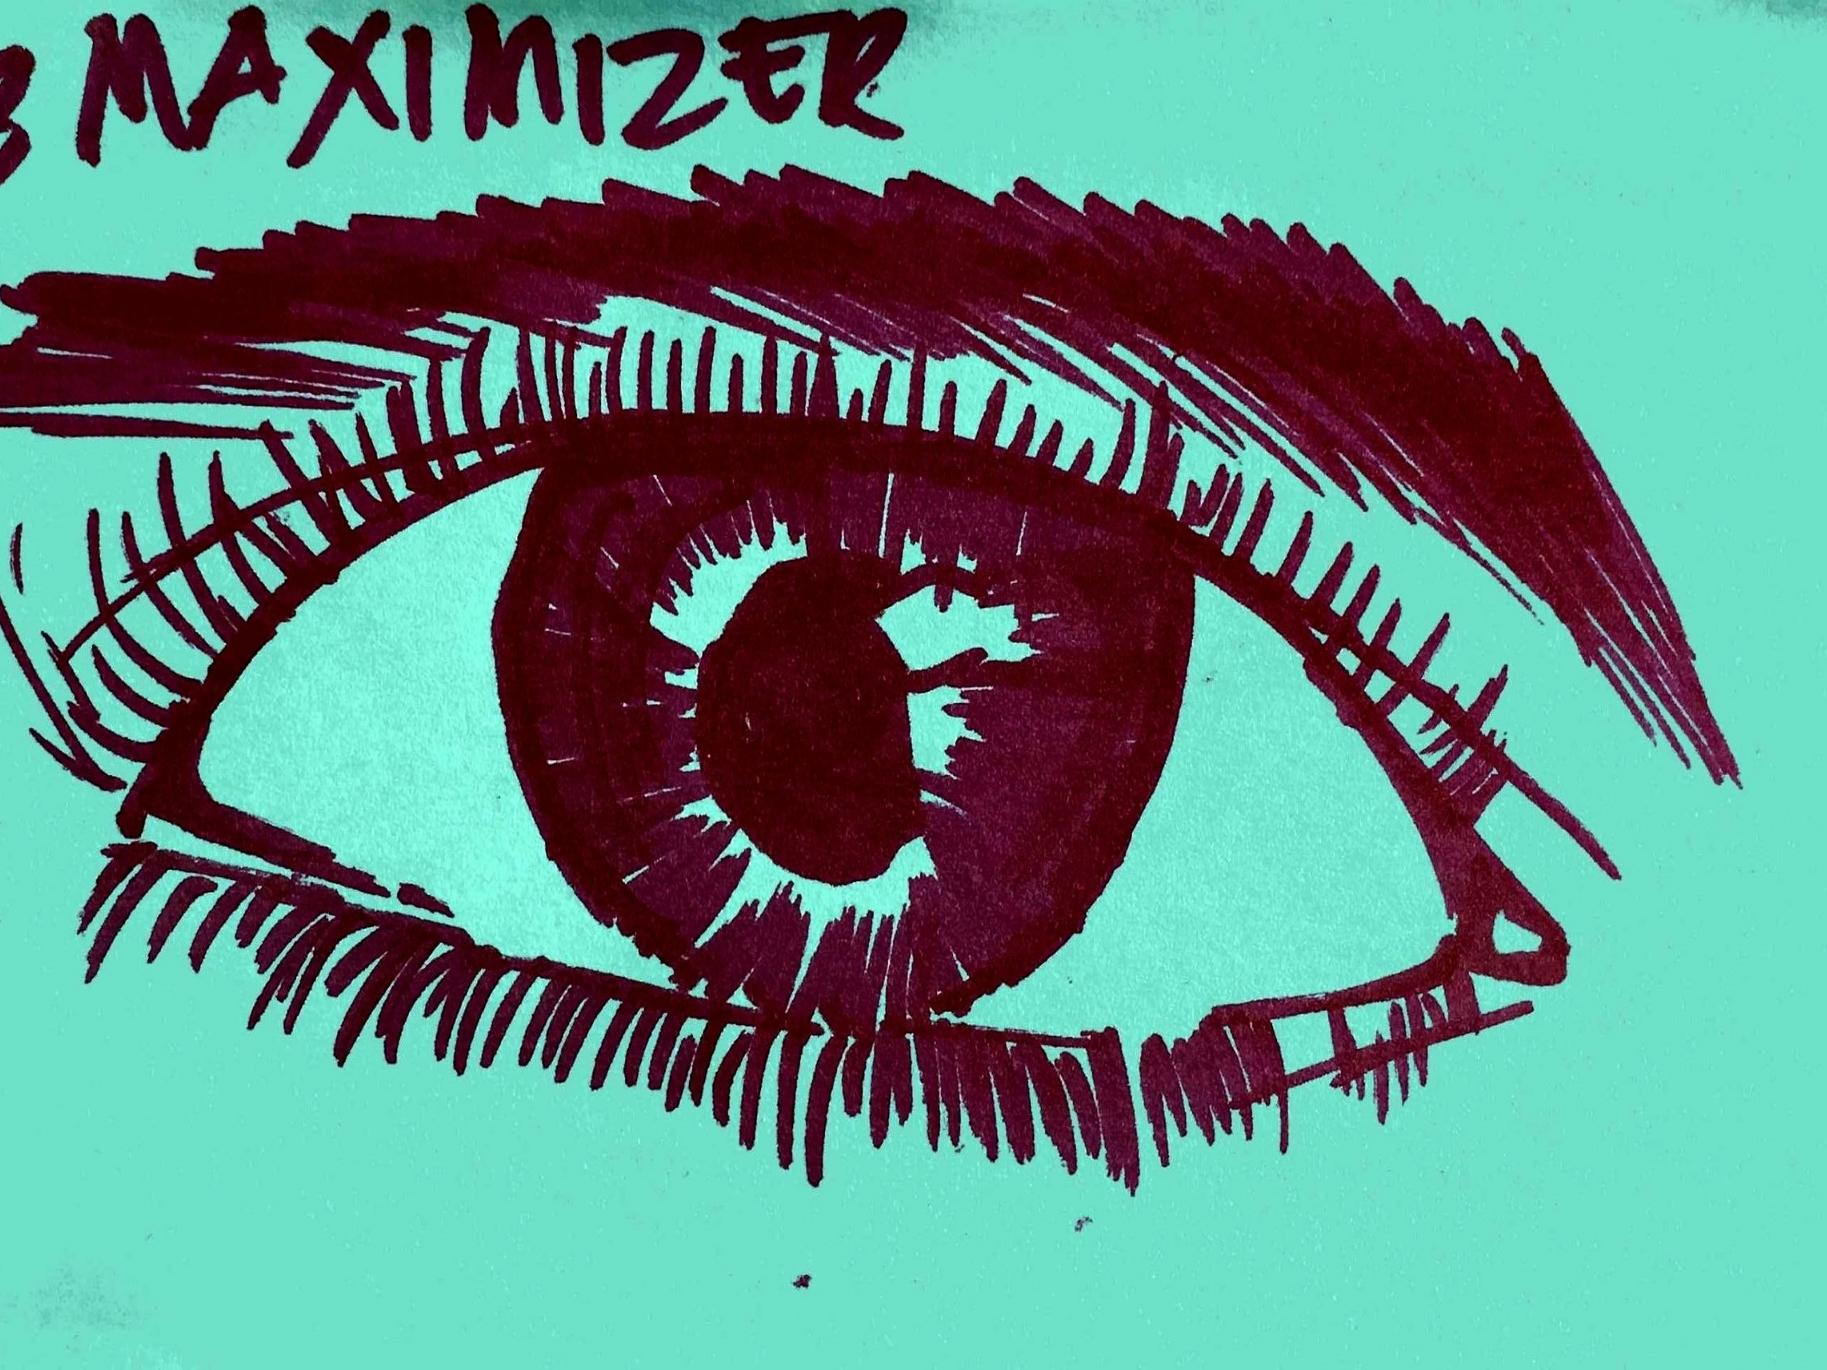 Maximizer Strengthsfinder Eye